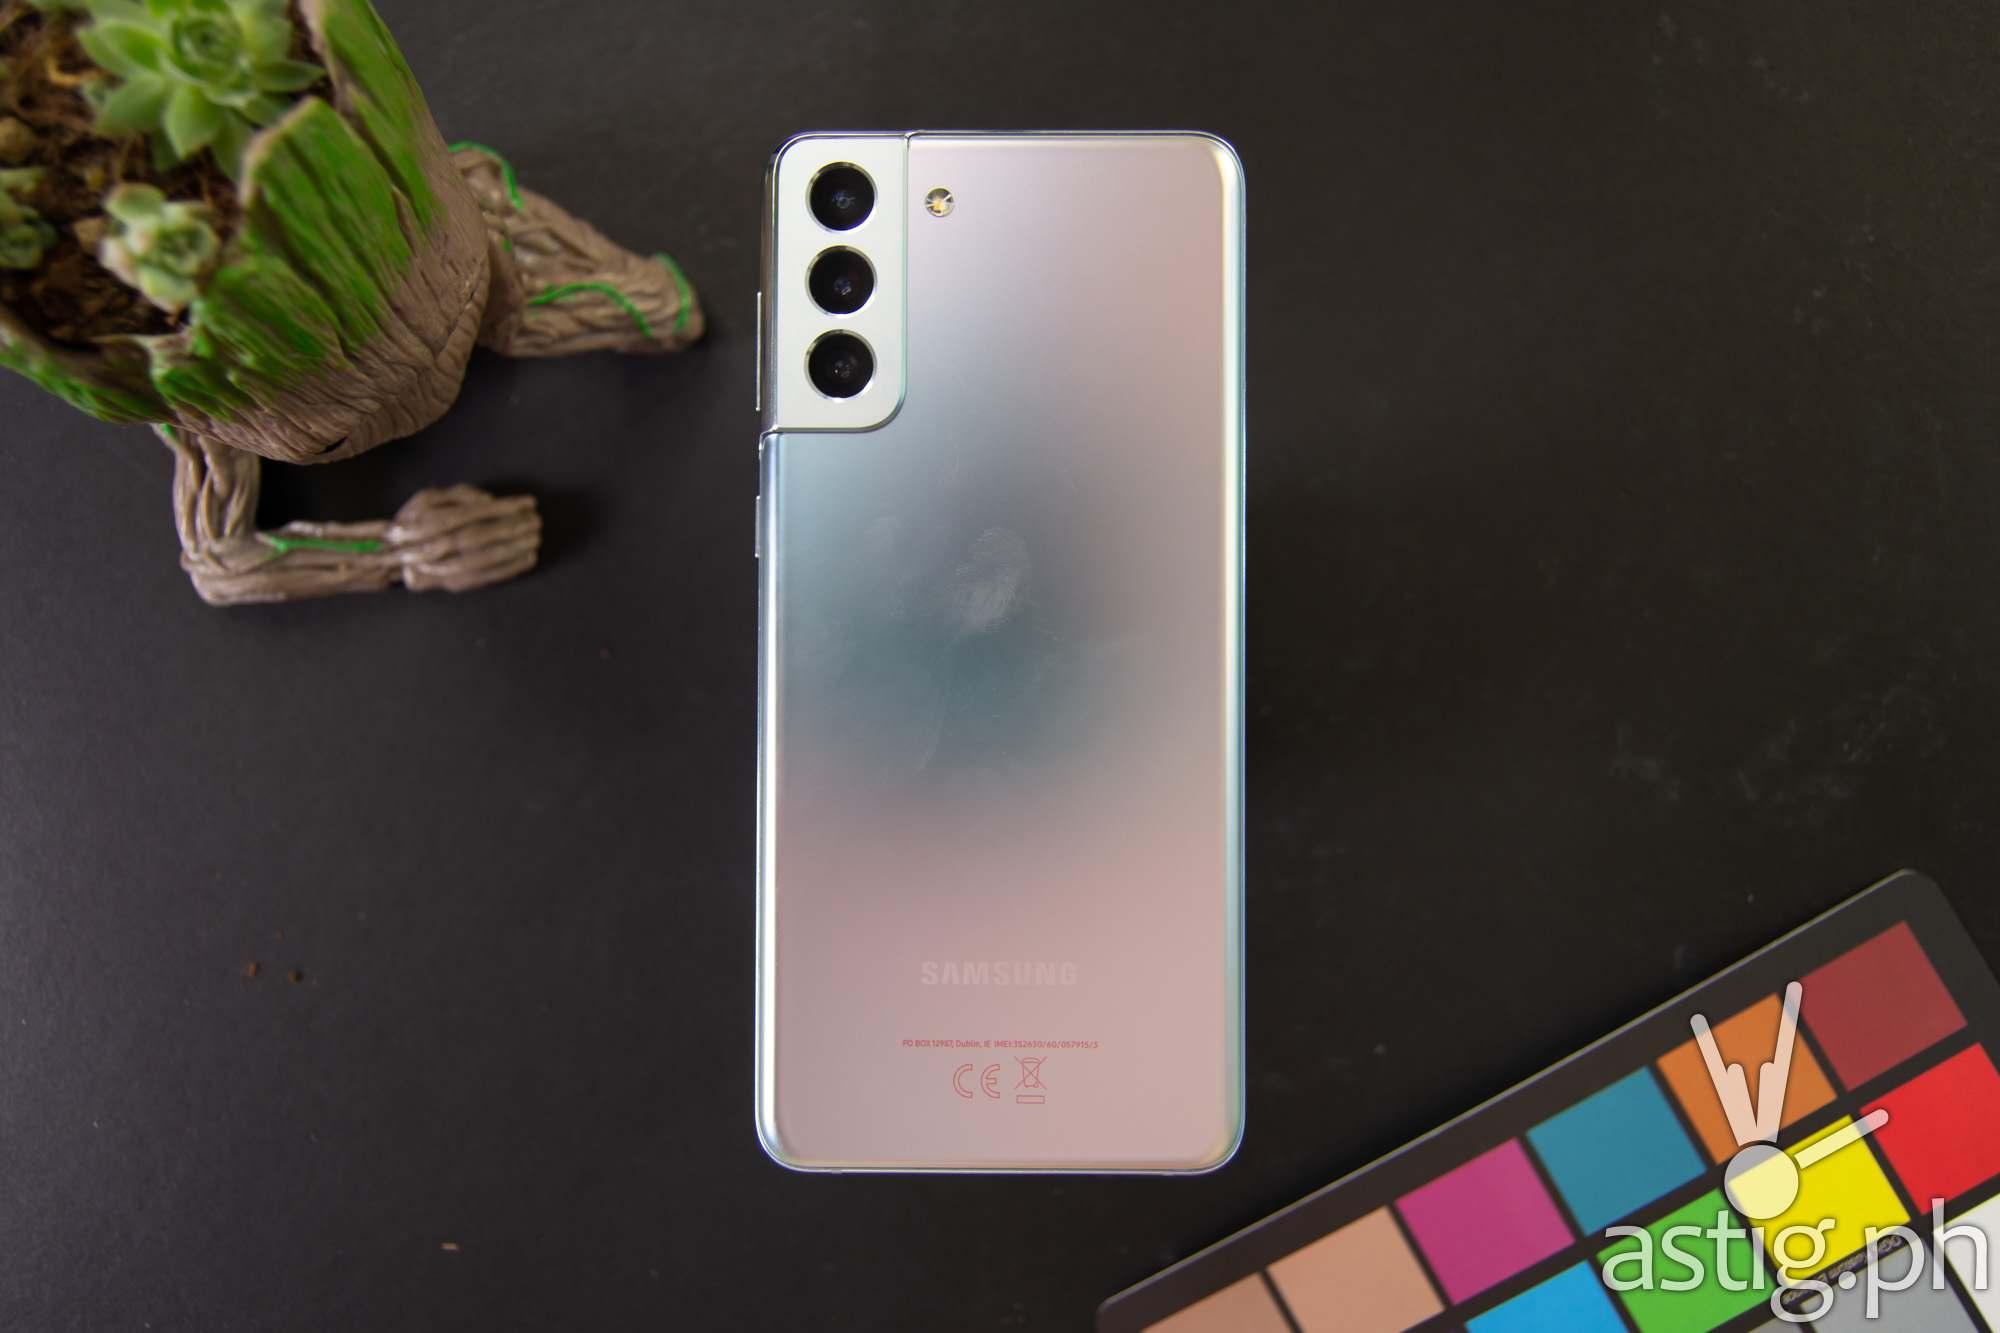 Back - Samsung Galaxy S21 Plus 5G(Philippines)